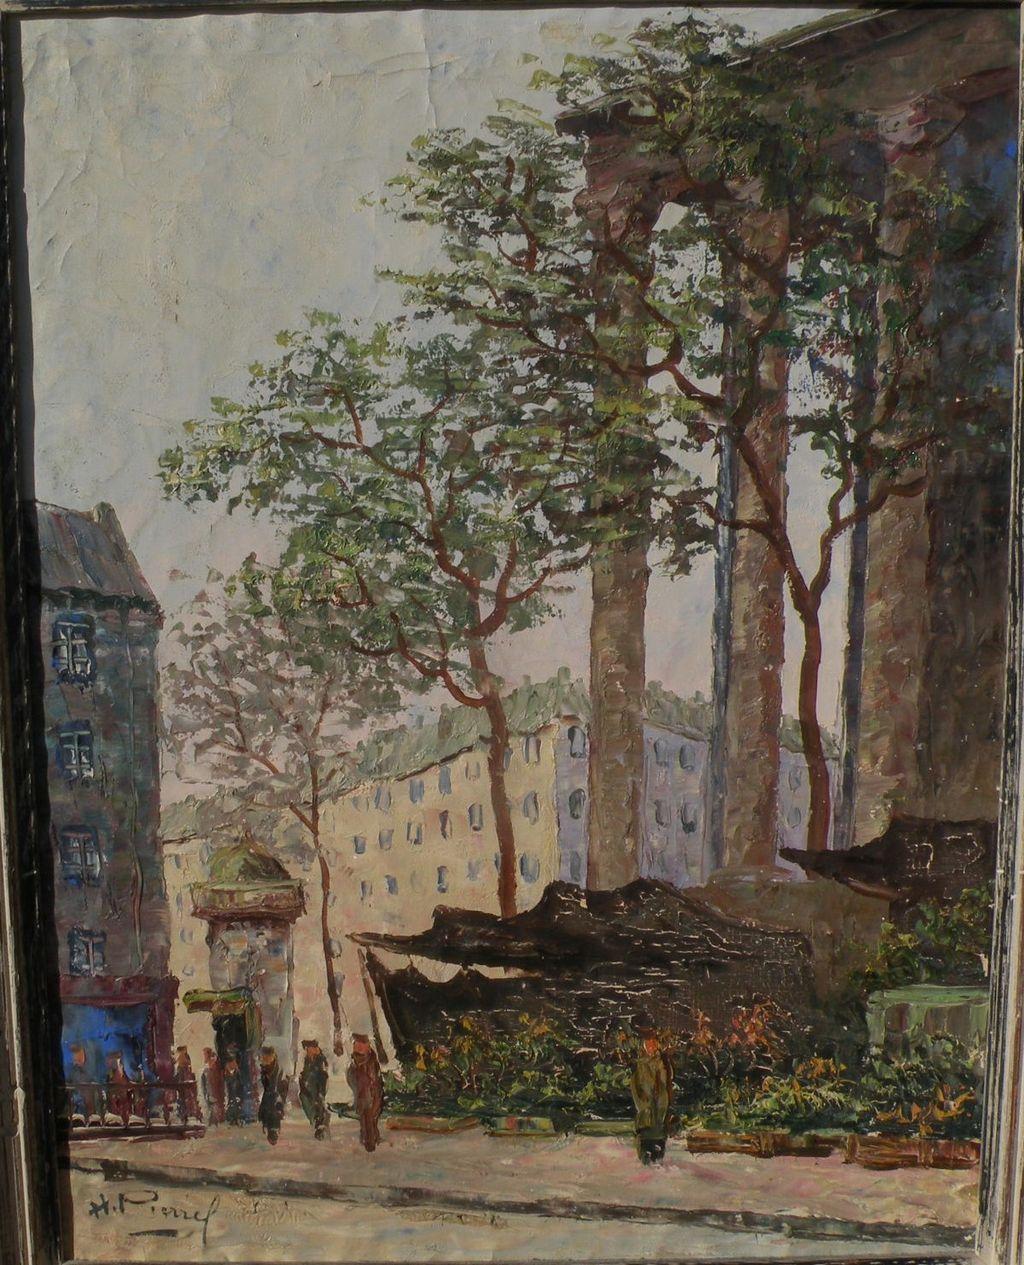 H. PIERREL circa 1960 Paris painting of La Madeleine flower market